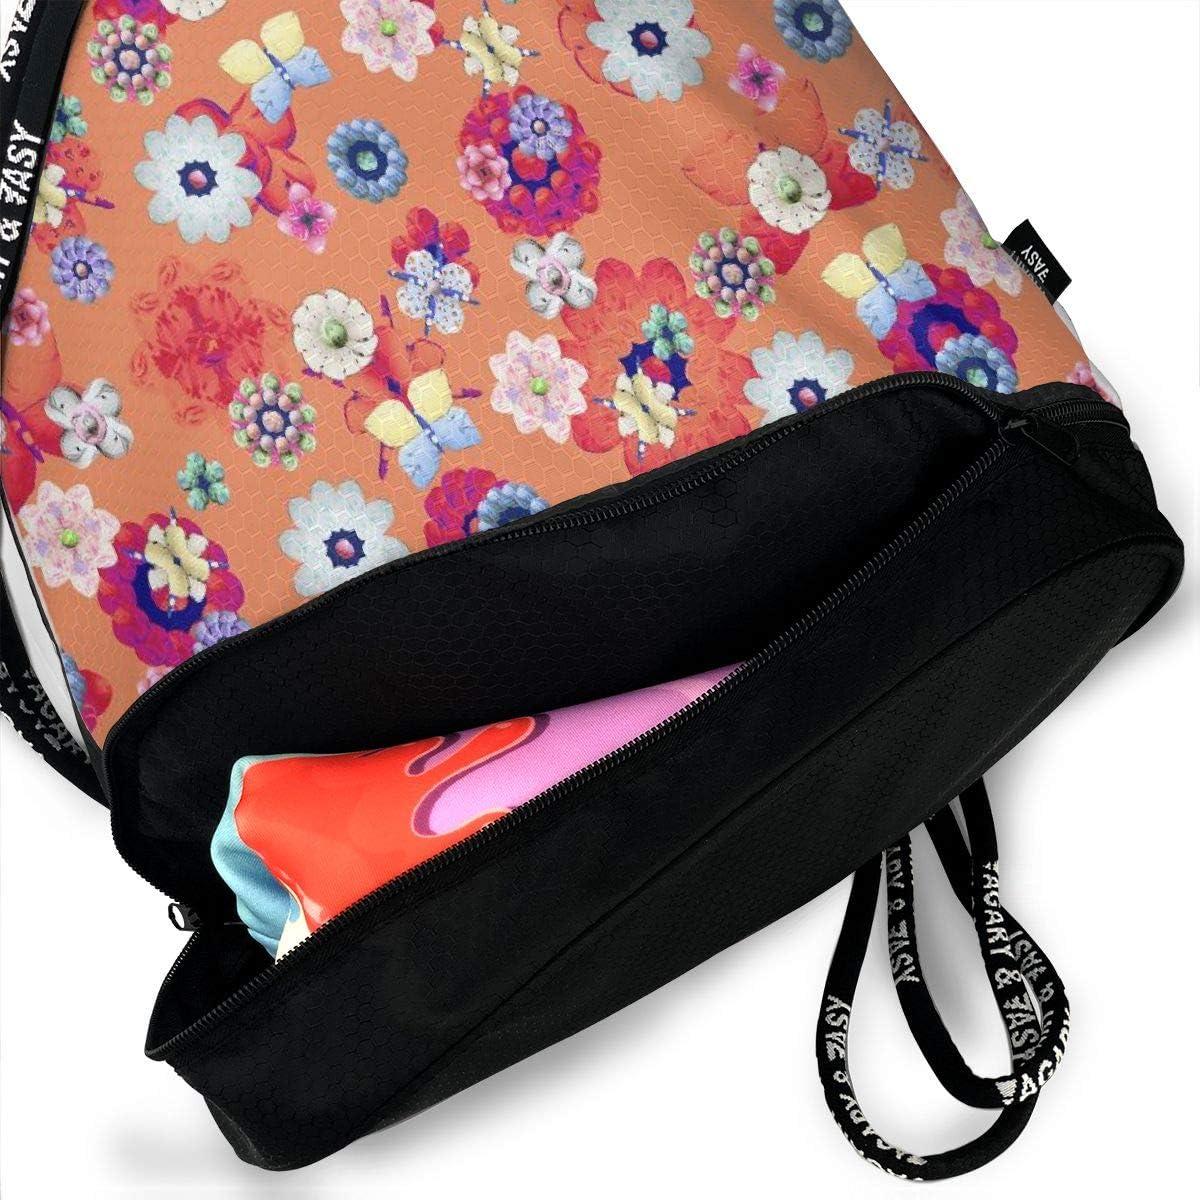 Meadow Bright Flowers Colorful Butterflies Drawstring Bag Multipurpose Bundle Dance Bag Sack Pack